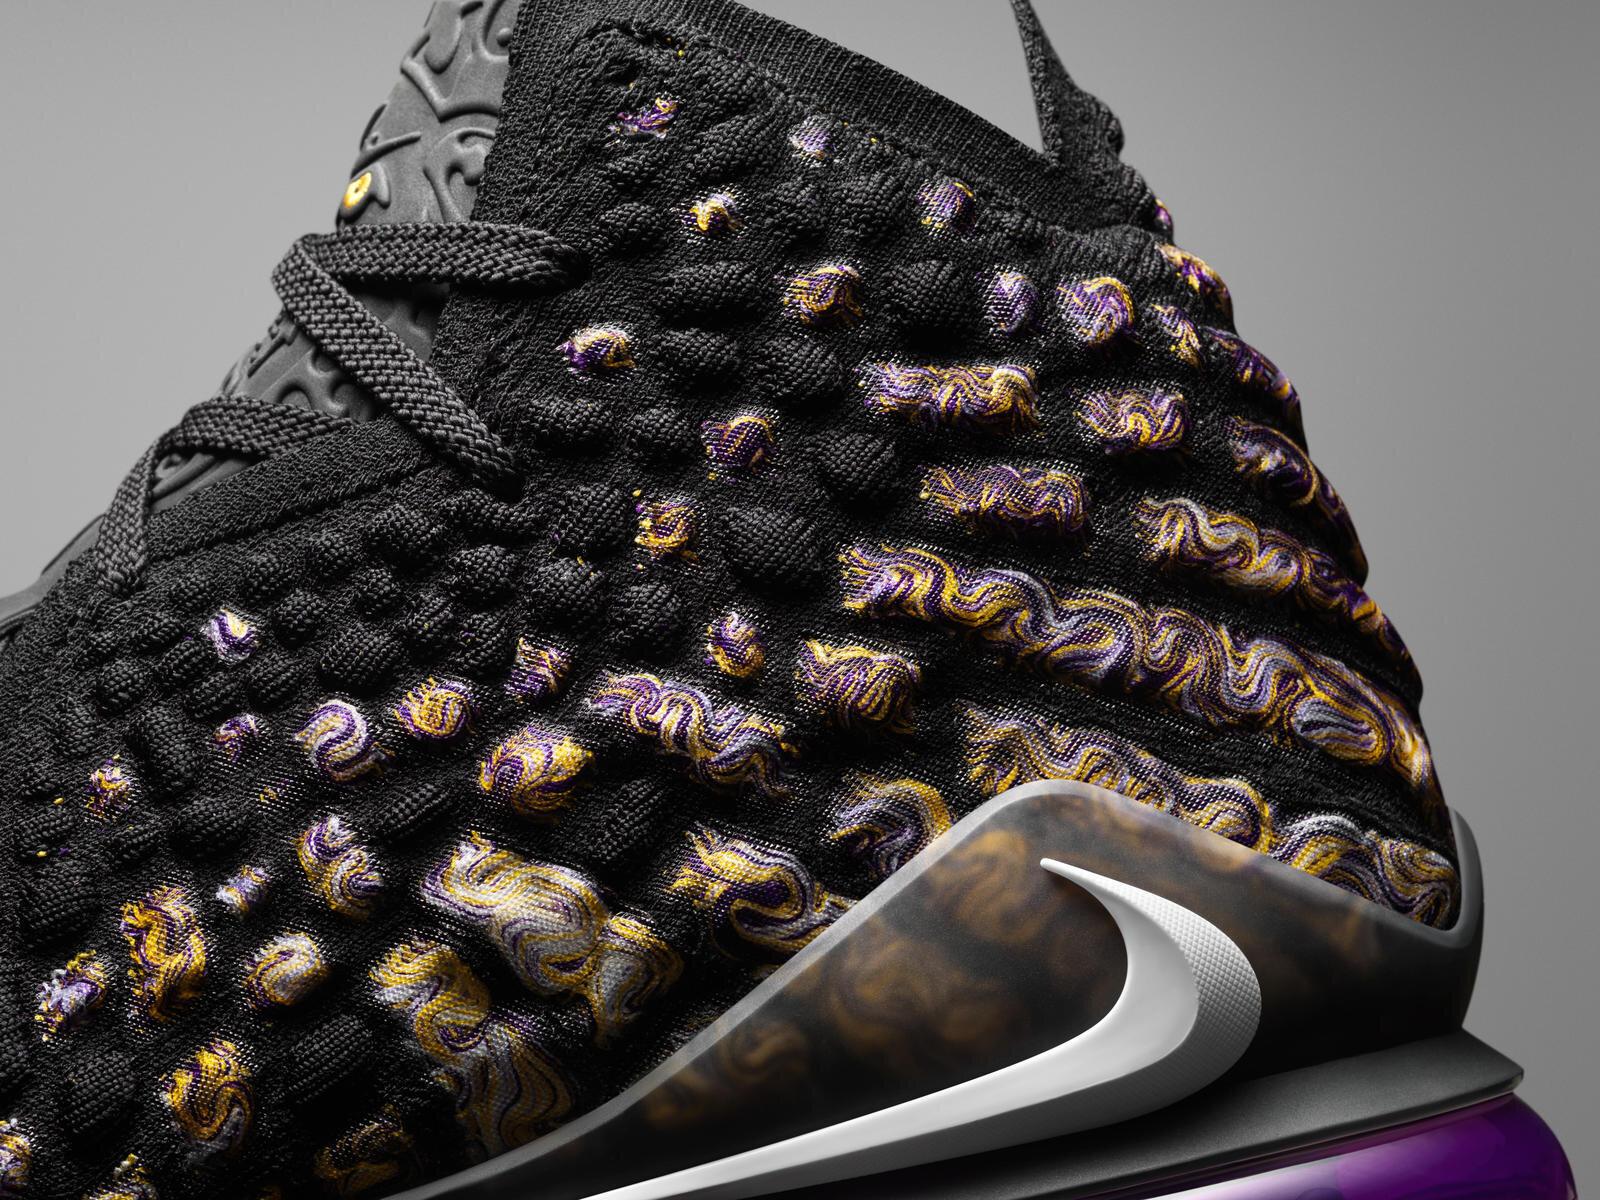 NikeNews_HO19_BB_LeBron17_Purple_Gold_Knitposite_90405.jpg